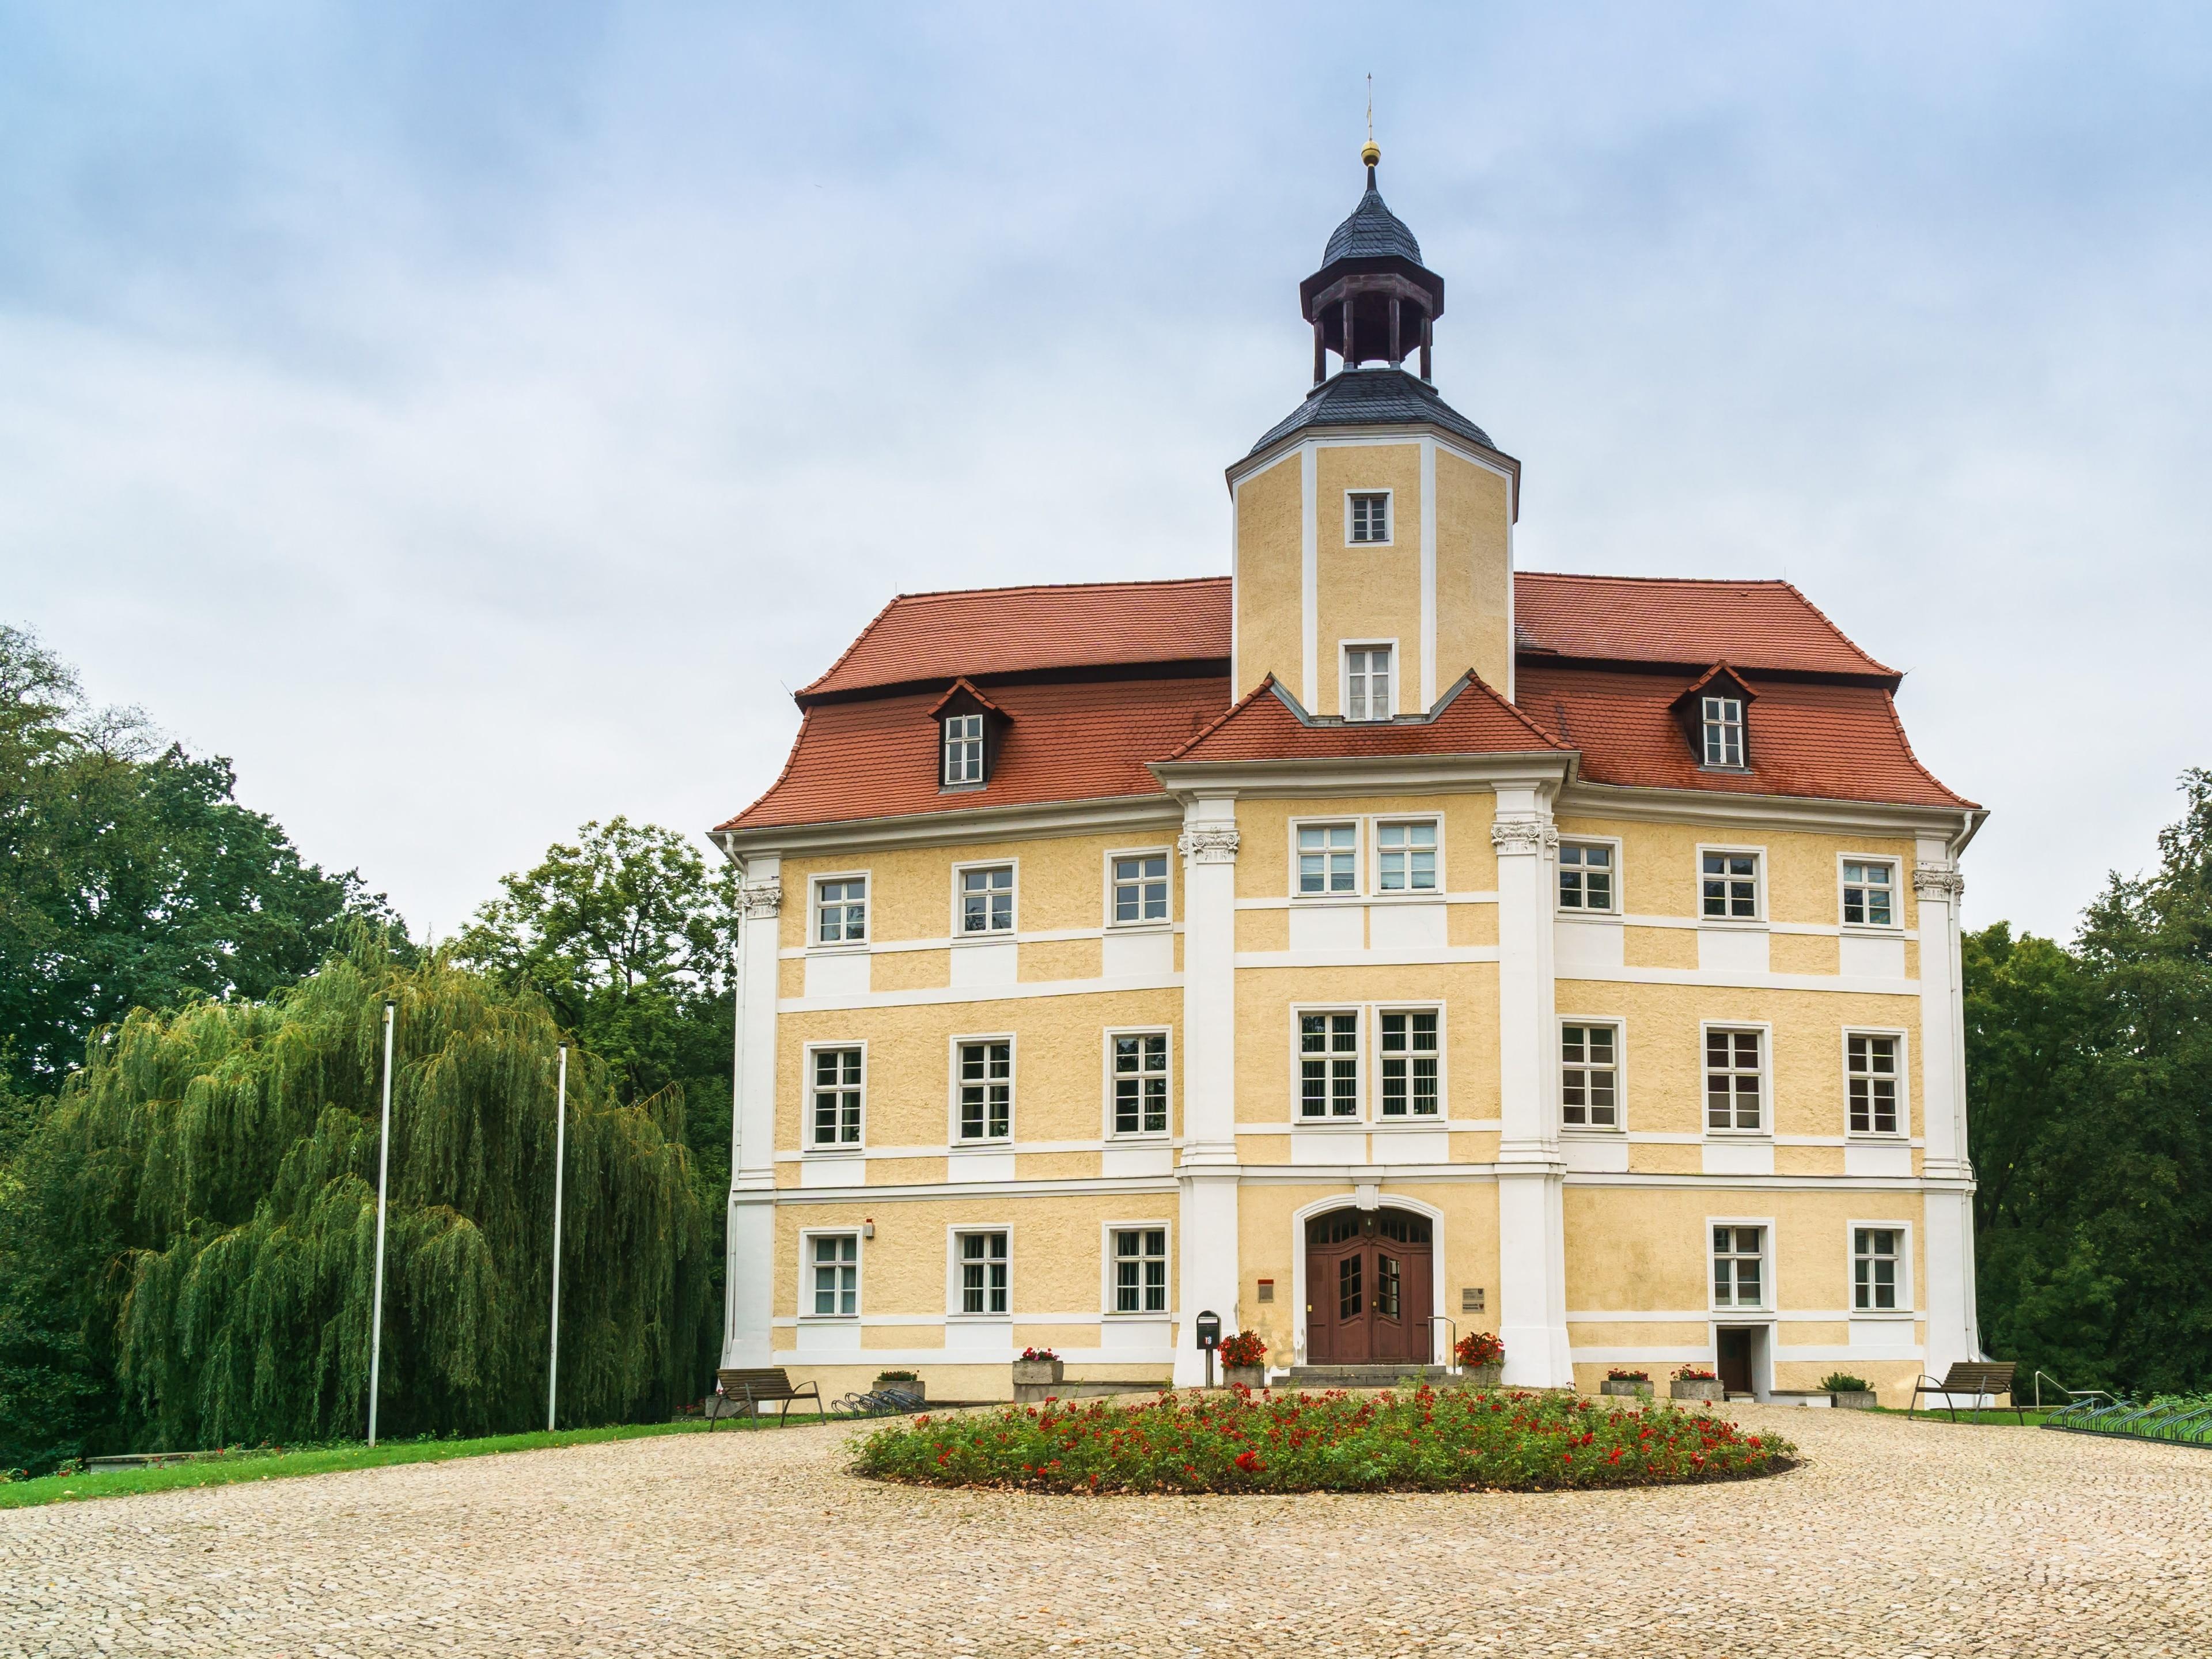 Vetschau/Spreewald, Brandenburg Region, Germany